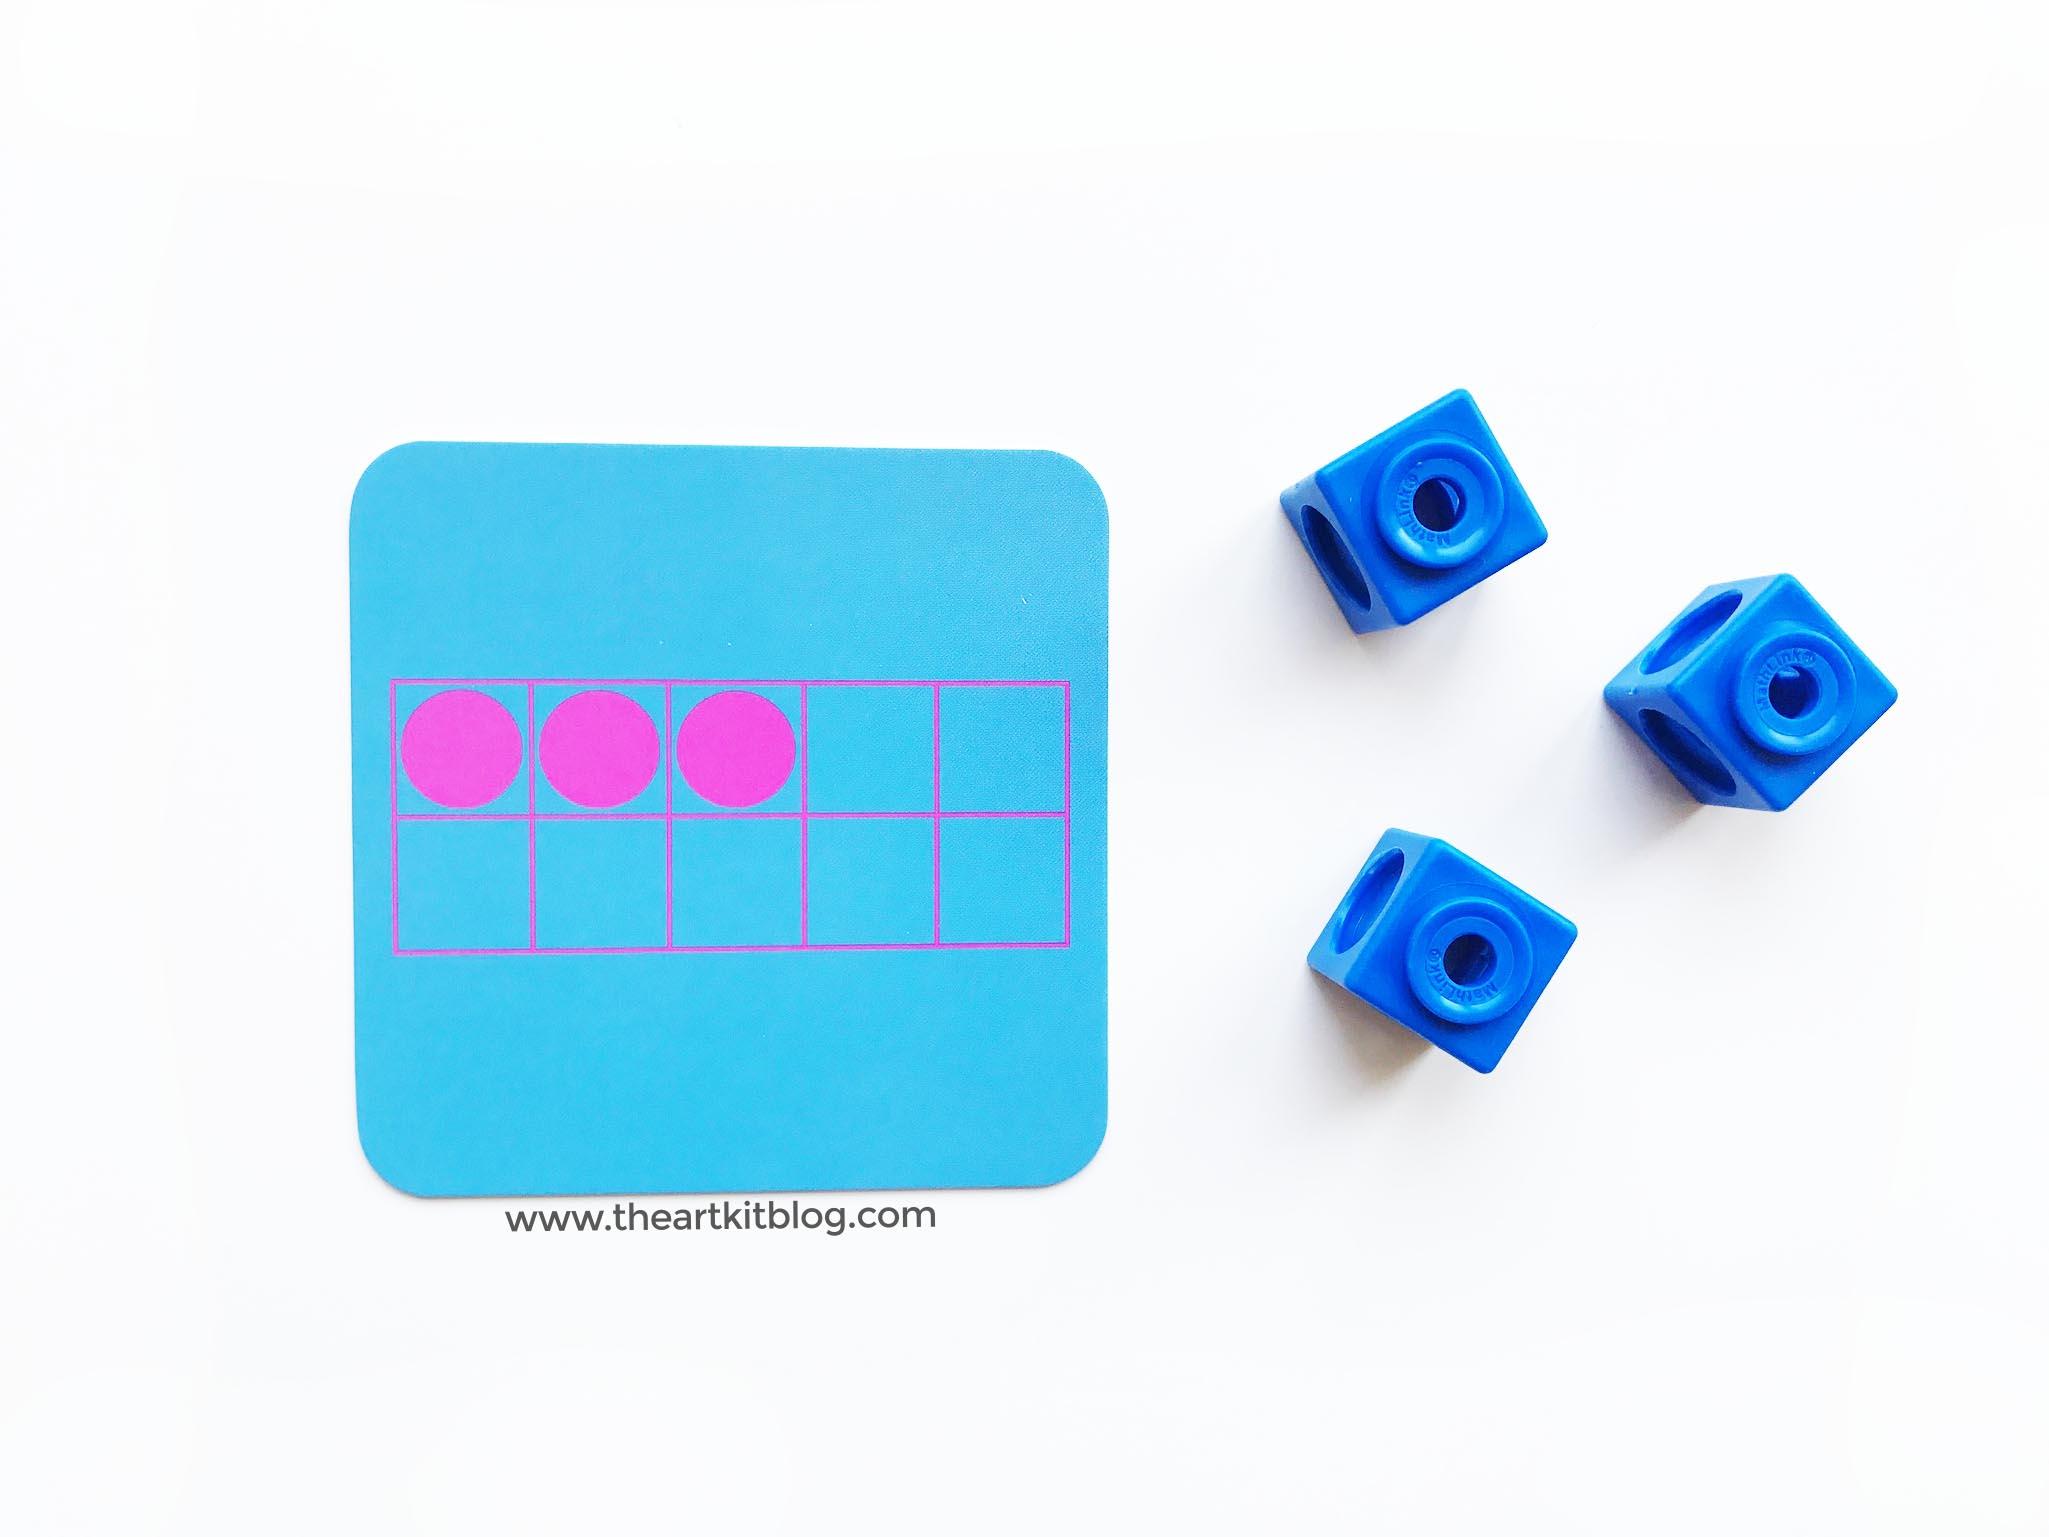 tiny polka dot game timberdoodle game for kids math - The Art Kit